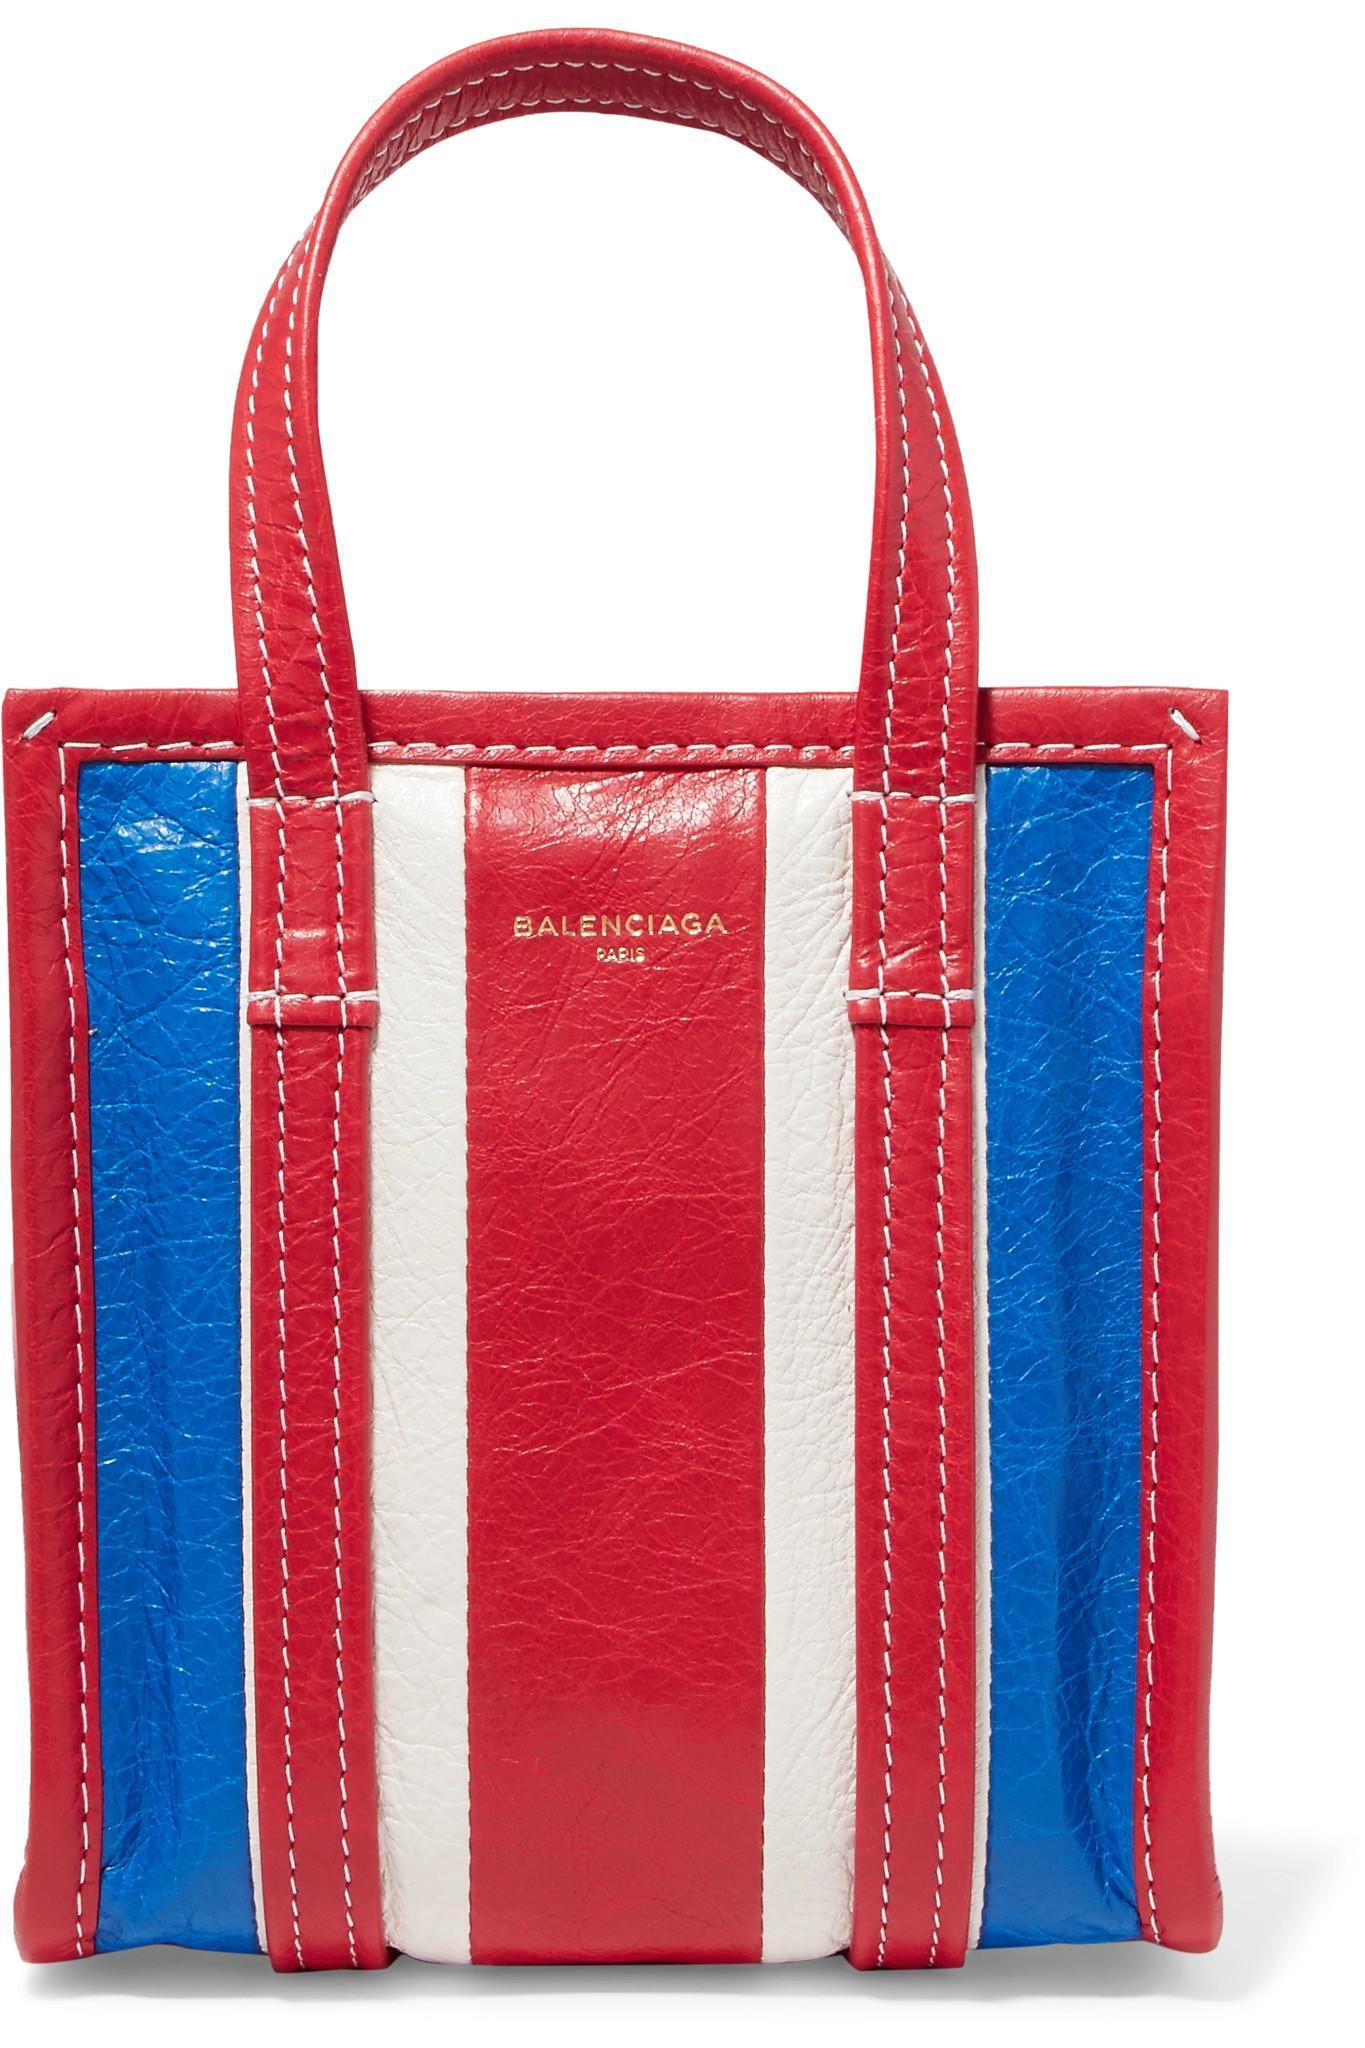 Balenciaga Sac à bandoulière en cuir rayé Bazar XXS DPH1oY